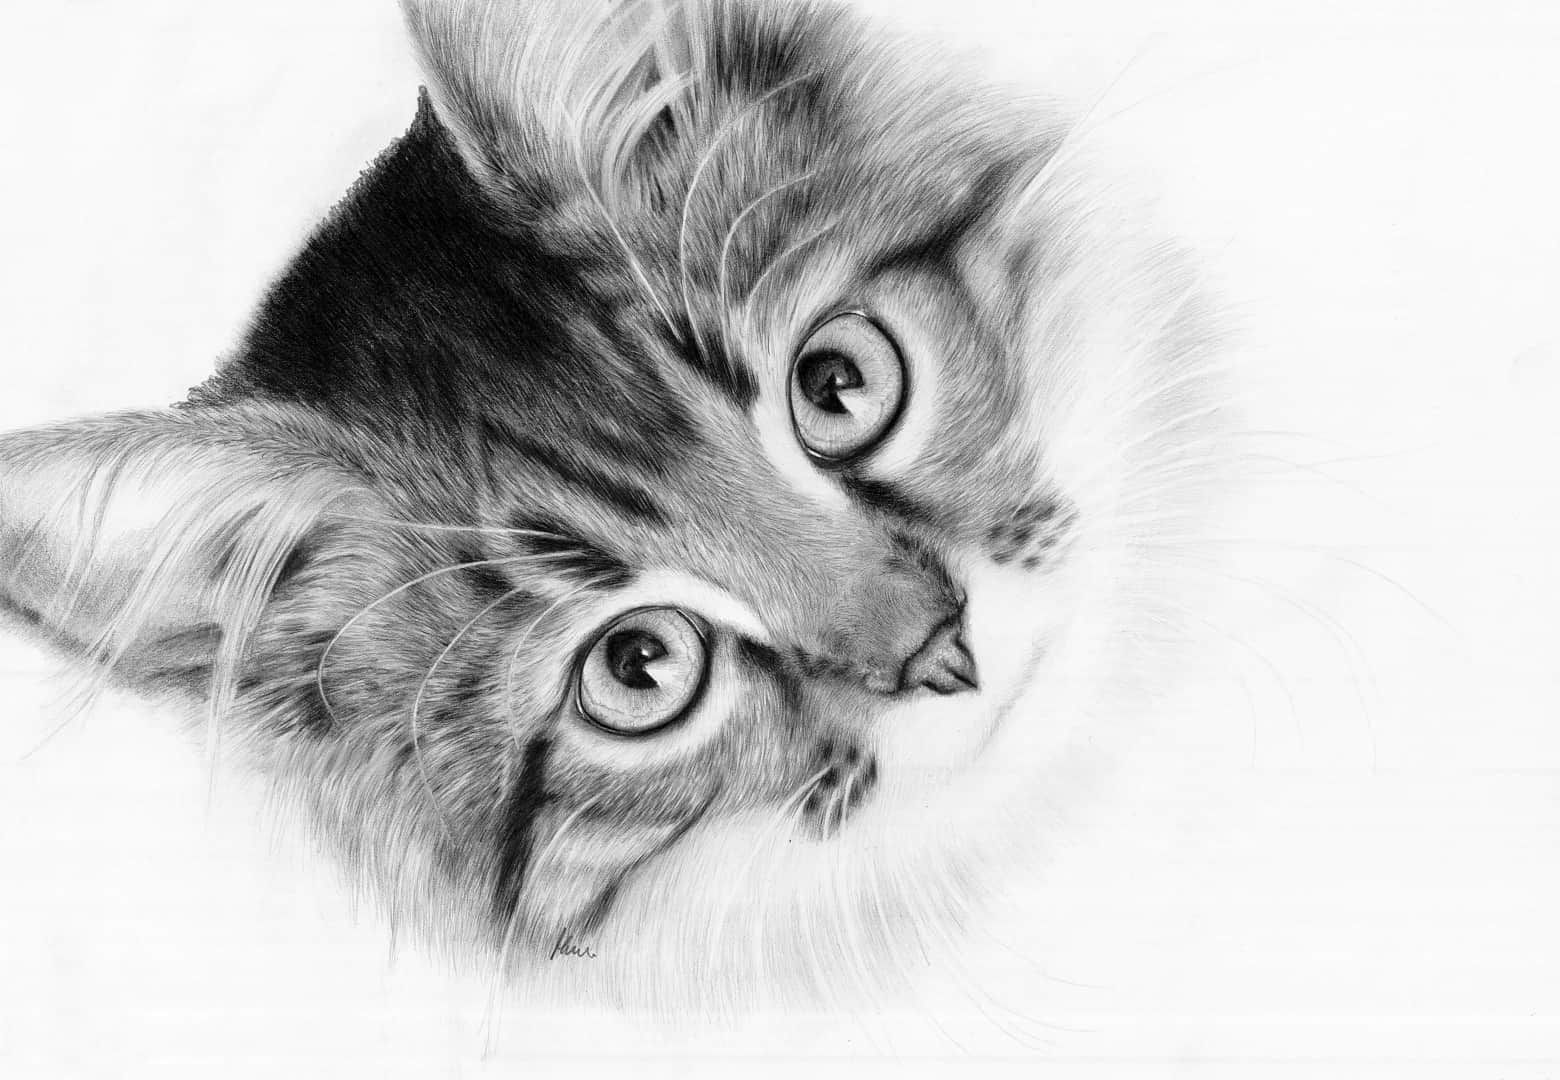 Kot Hipnotyczny Magdalena Muraszko Kowalska Rysunki Animal Portraits Art Cats Pet Portraits